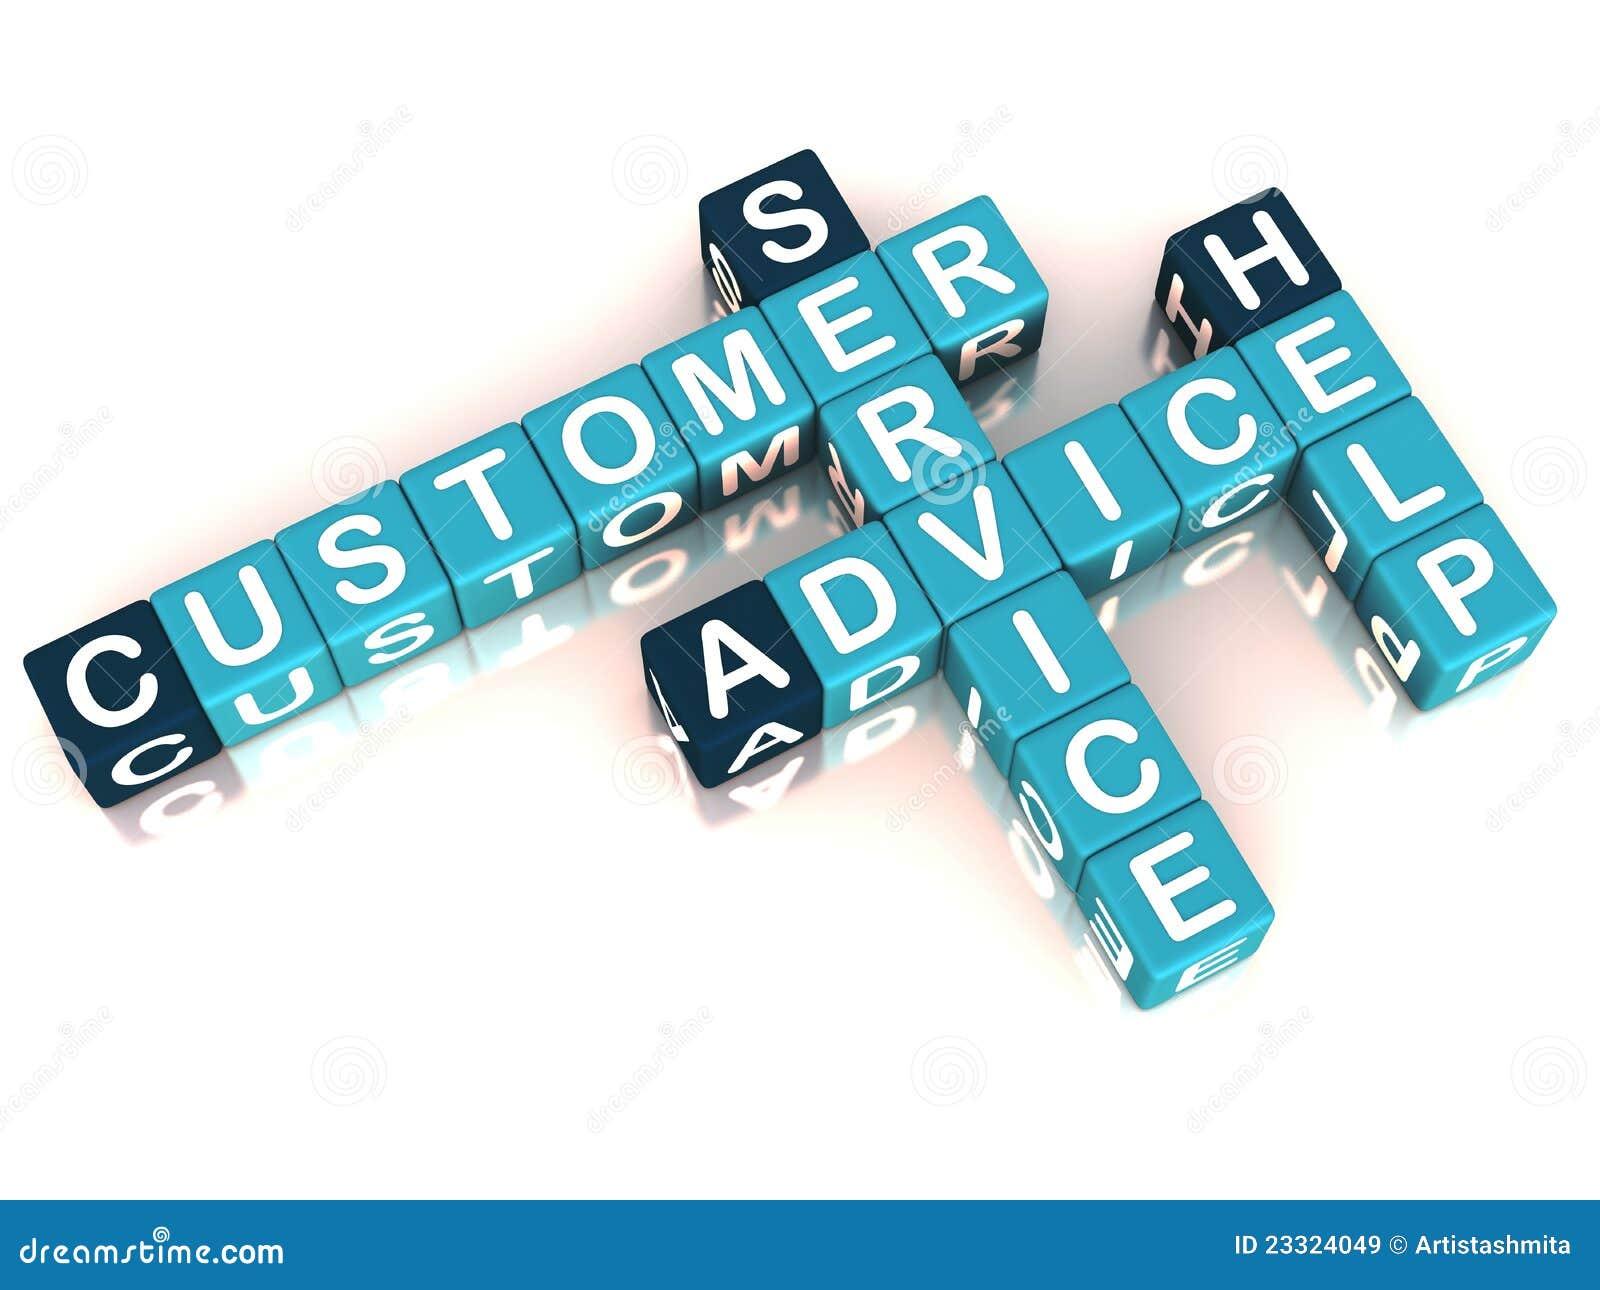 Time com customerservice